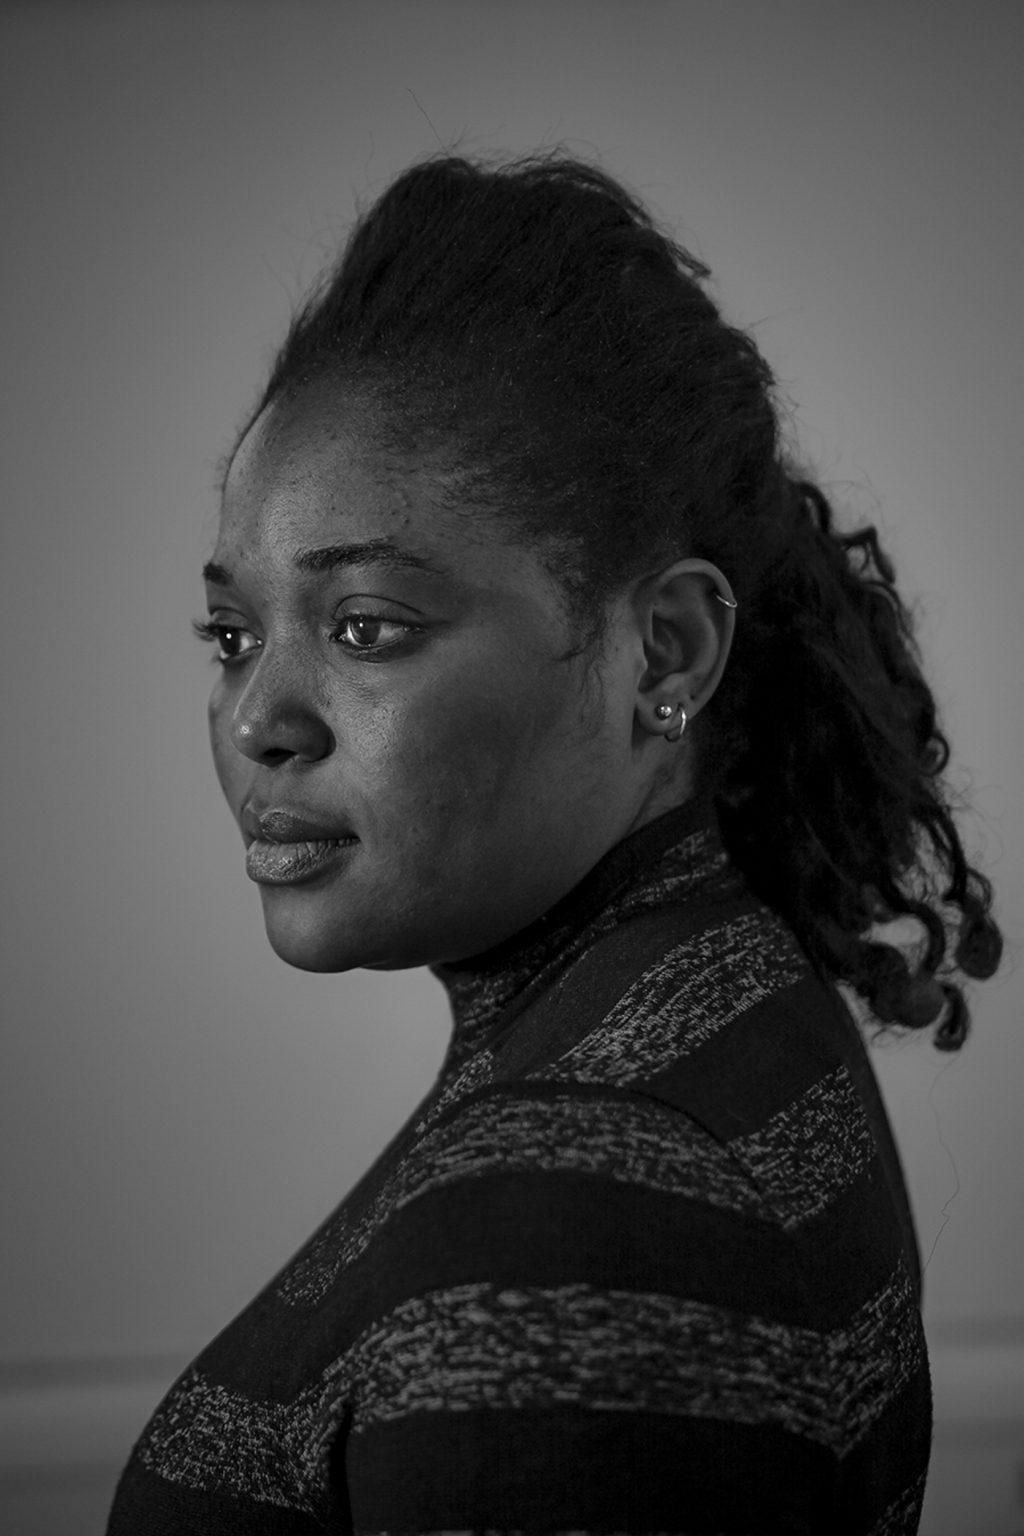 Portrait of Eghe Enofe, born in 1995 in Nigeria. Reggio Emilia, Italy, 2019